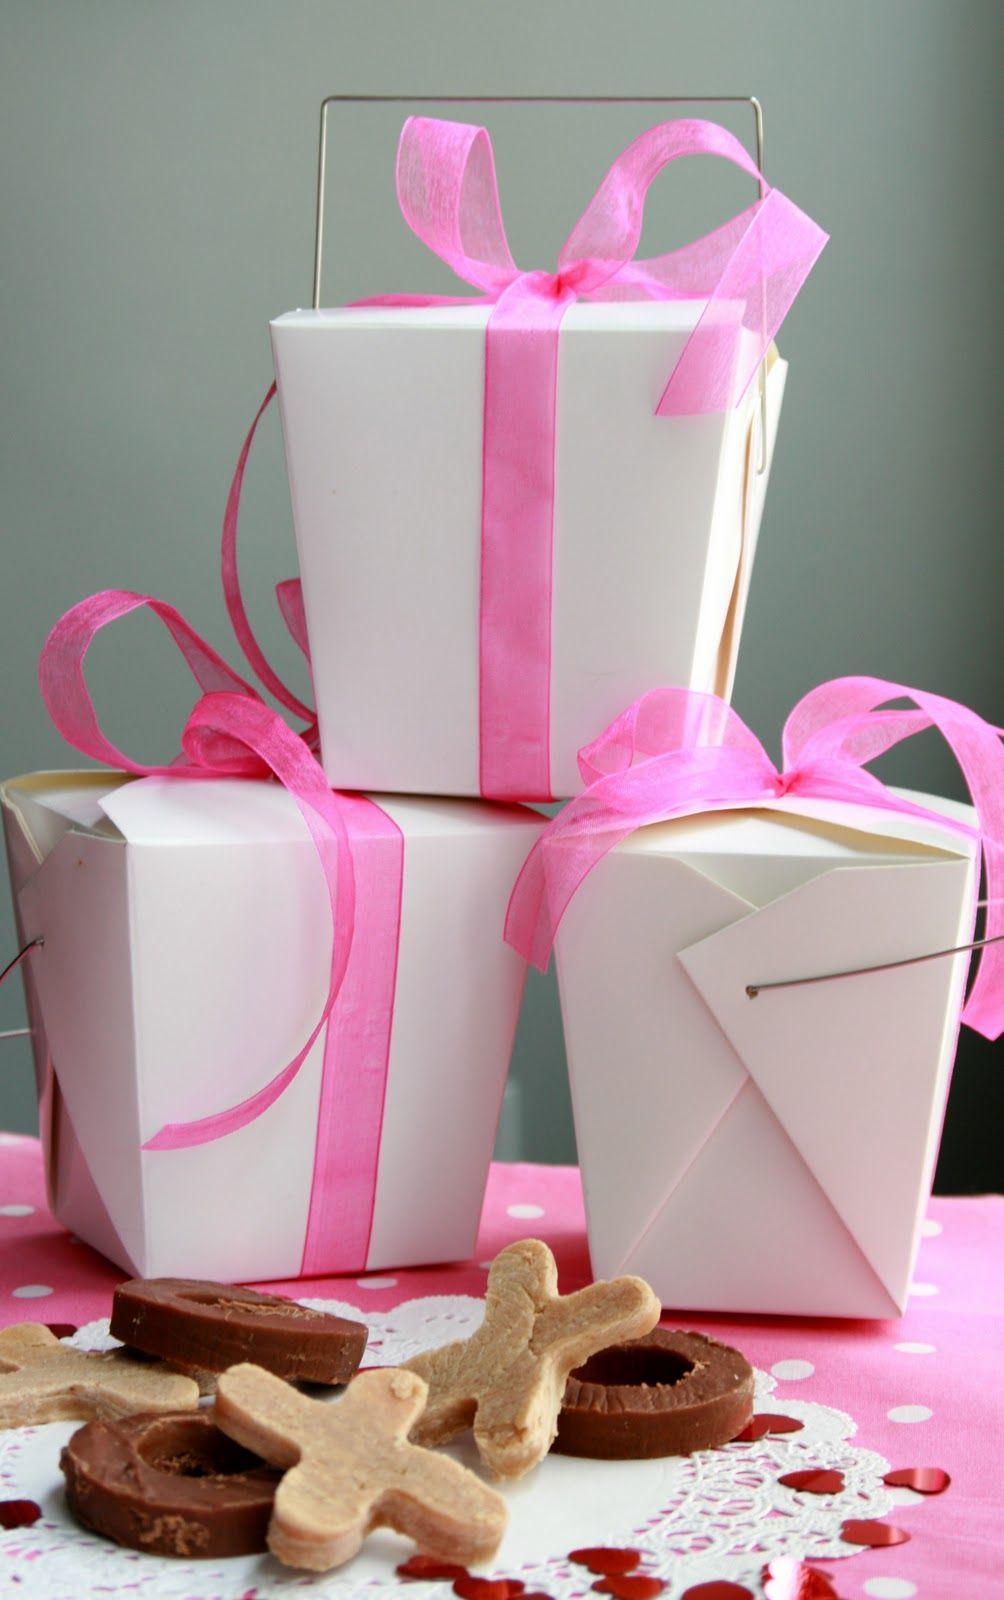 Cute feminine packaging | Fudge | Pinterest | Feminine and Packaging ...